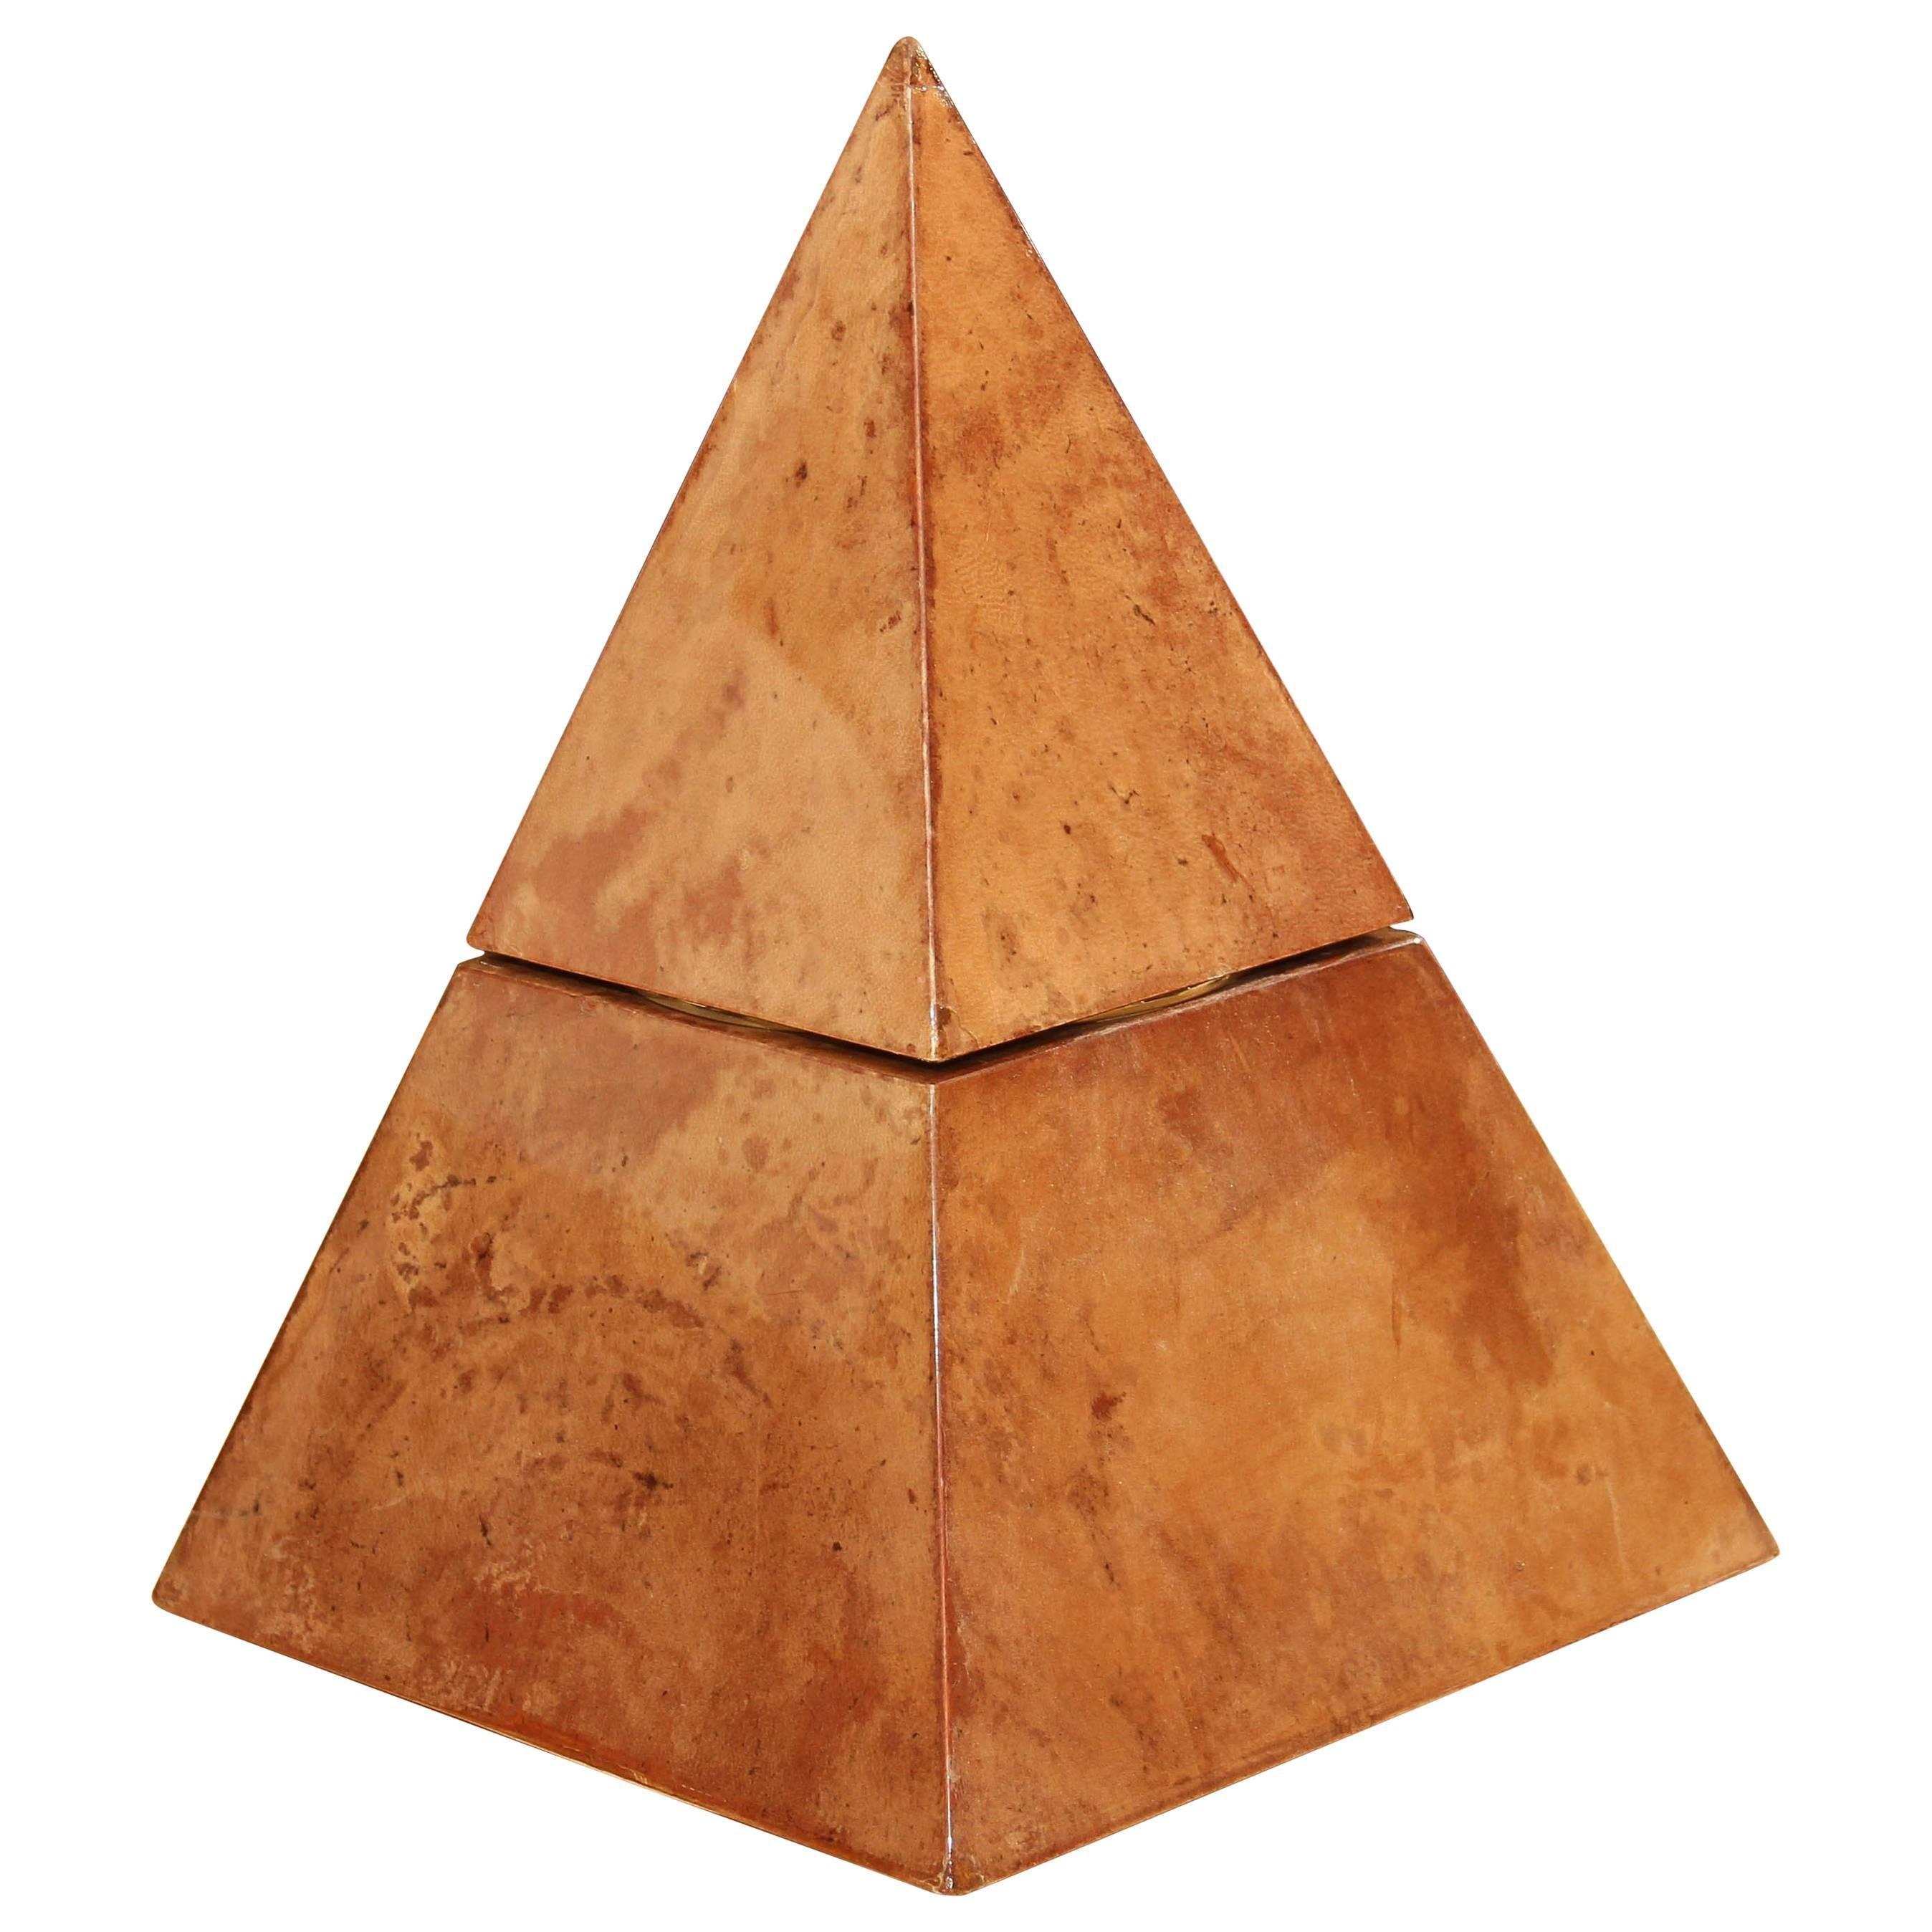 Aldo Tura Lacquered Goatskin Pyramidal Ice Bucket Sculpture